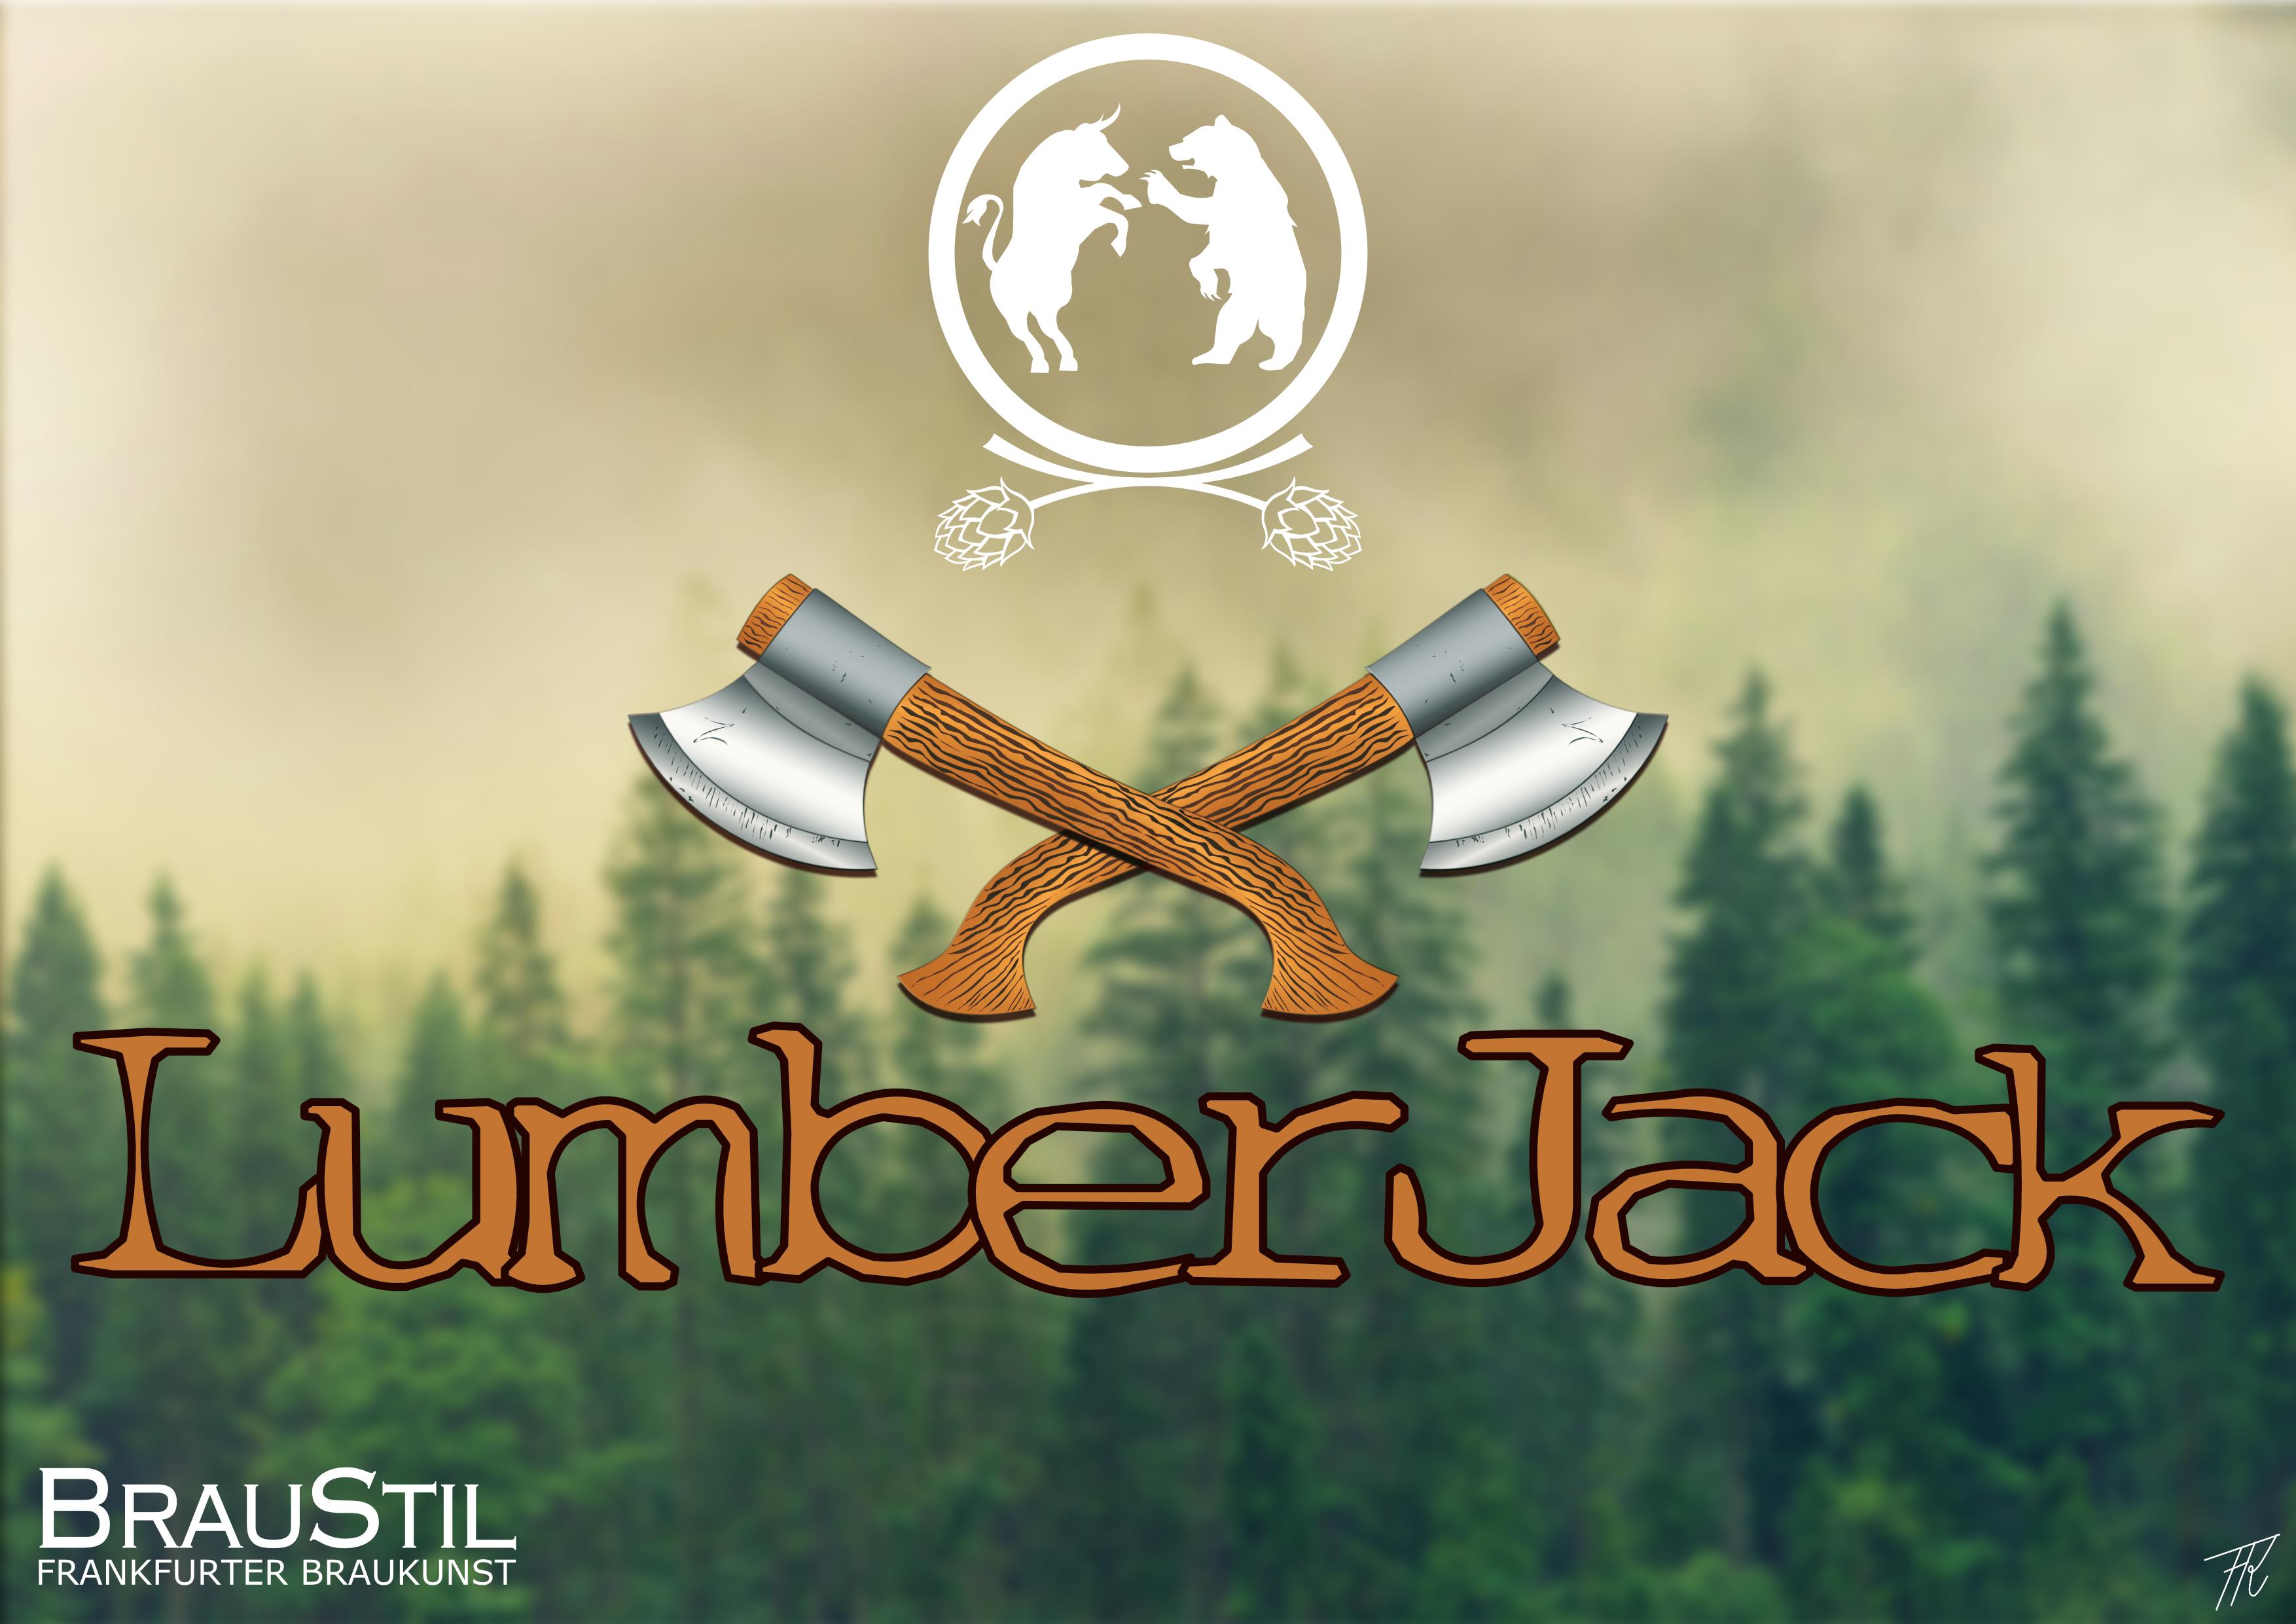 https://braustil.de/wp-content/uploads/2020/09/LumberJack-1.png